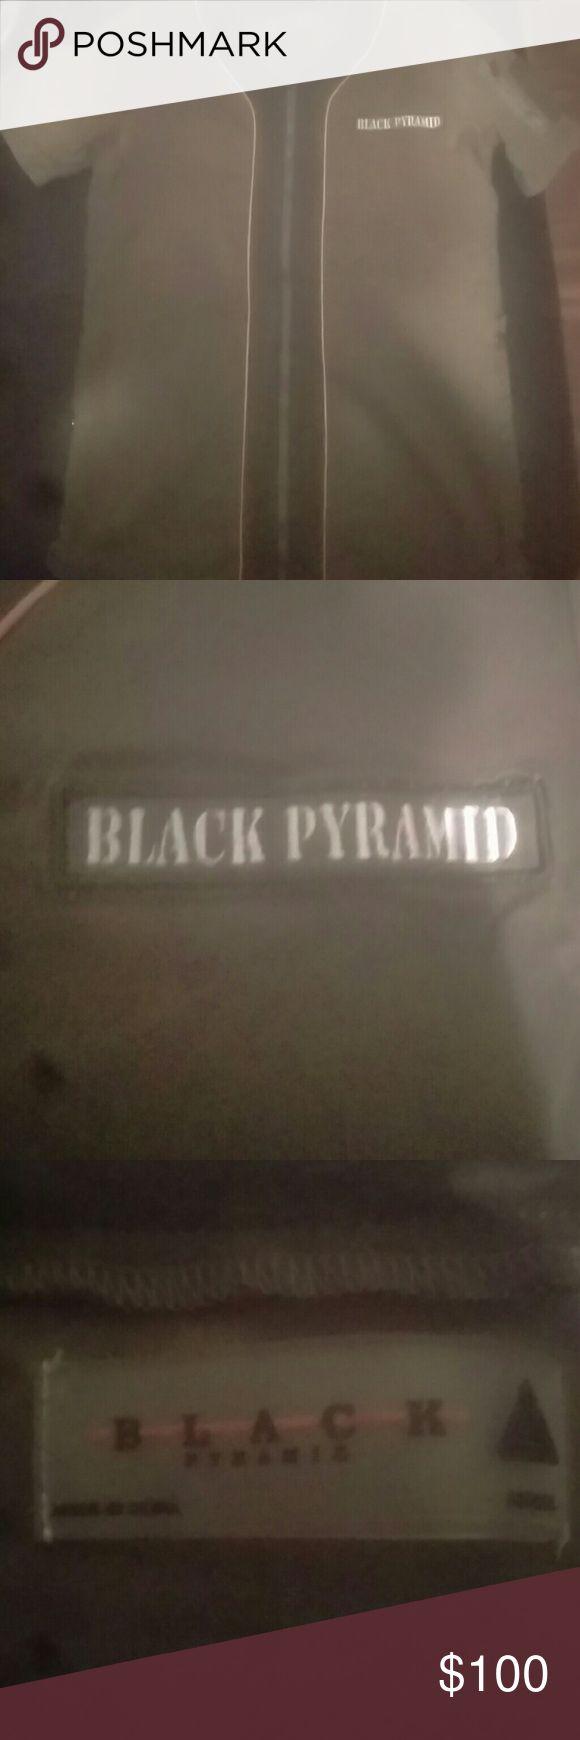 Chris Brown black pyramid shirt small Navy green with stash pocket on back of the shirt zips down and up black pyramid Shirts